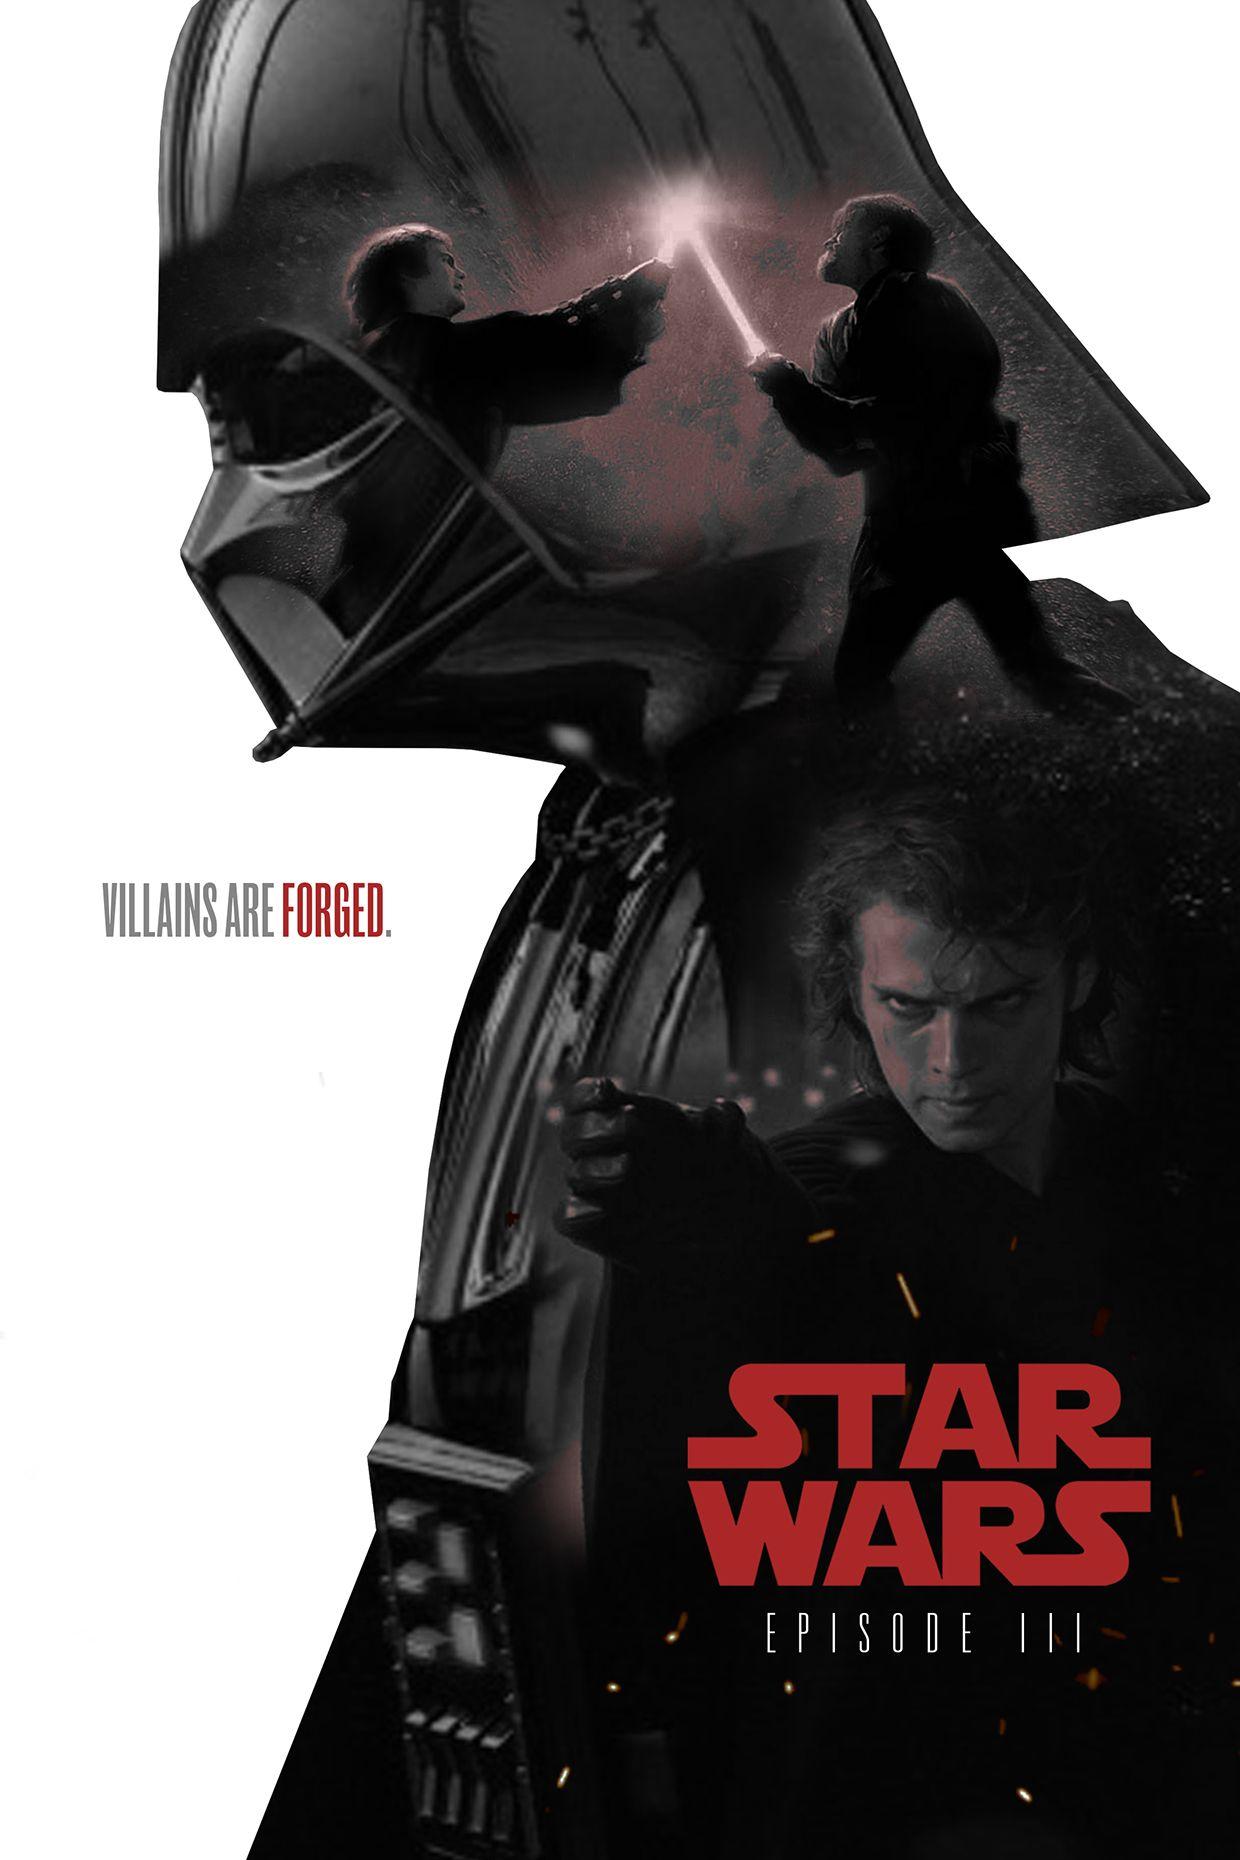 The Howling 1981 By Francesco Francavilla Hq Backgrounds Star Wars Star Wars Episode Ii Star Wars Episodes